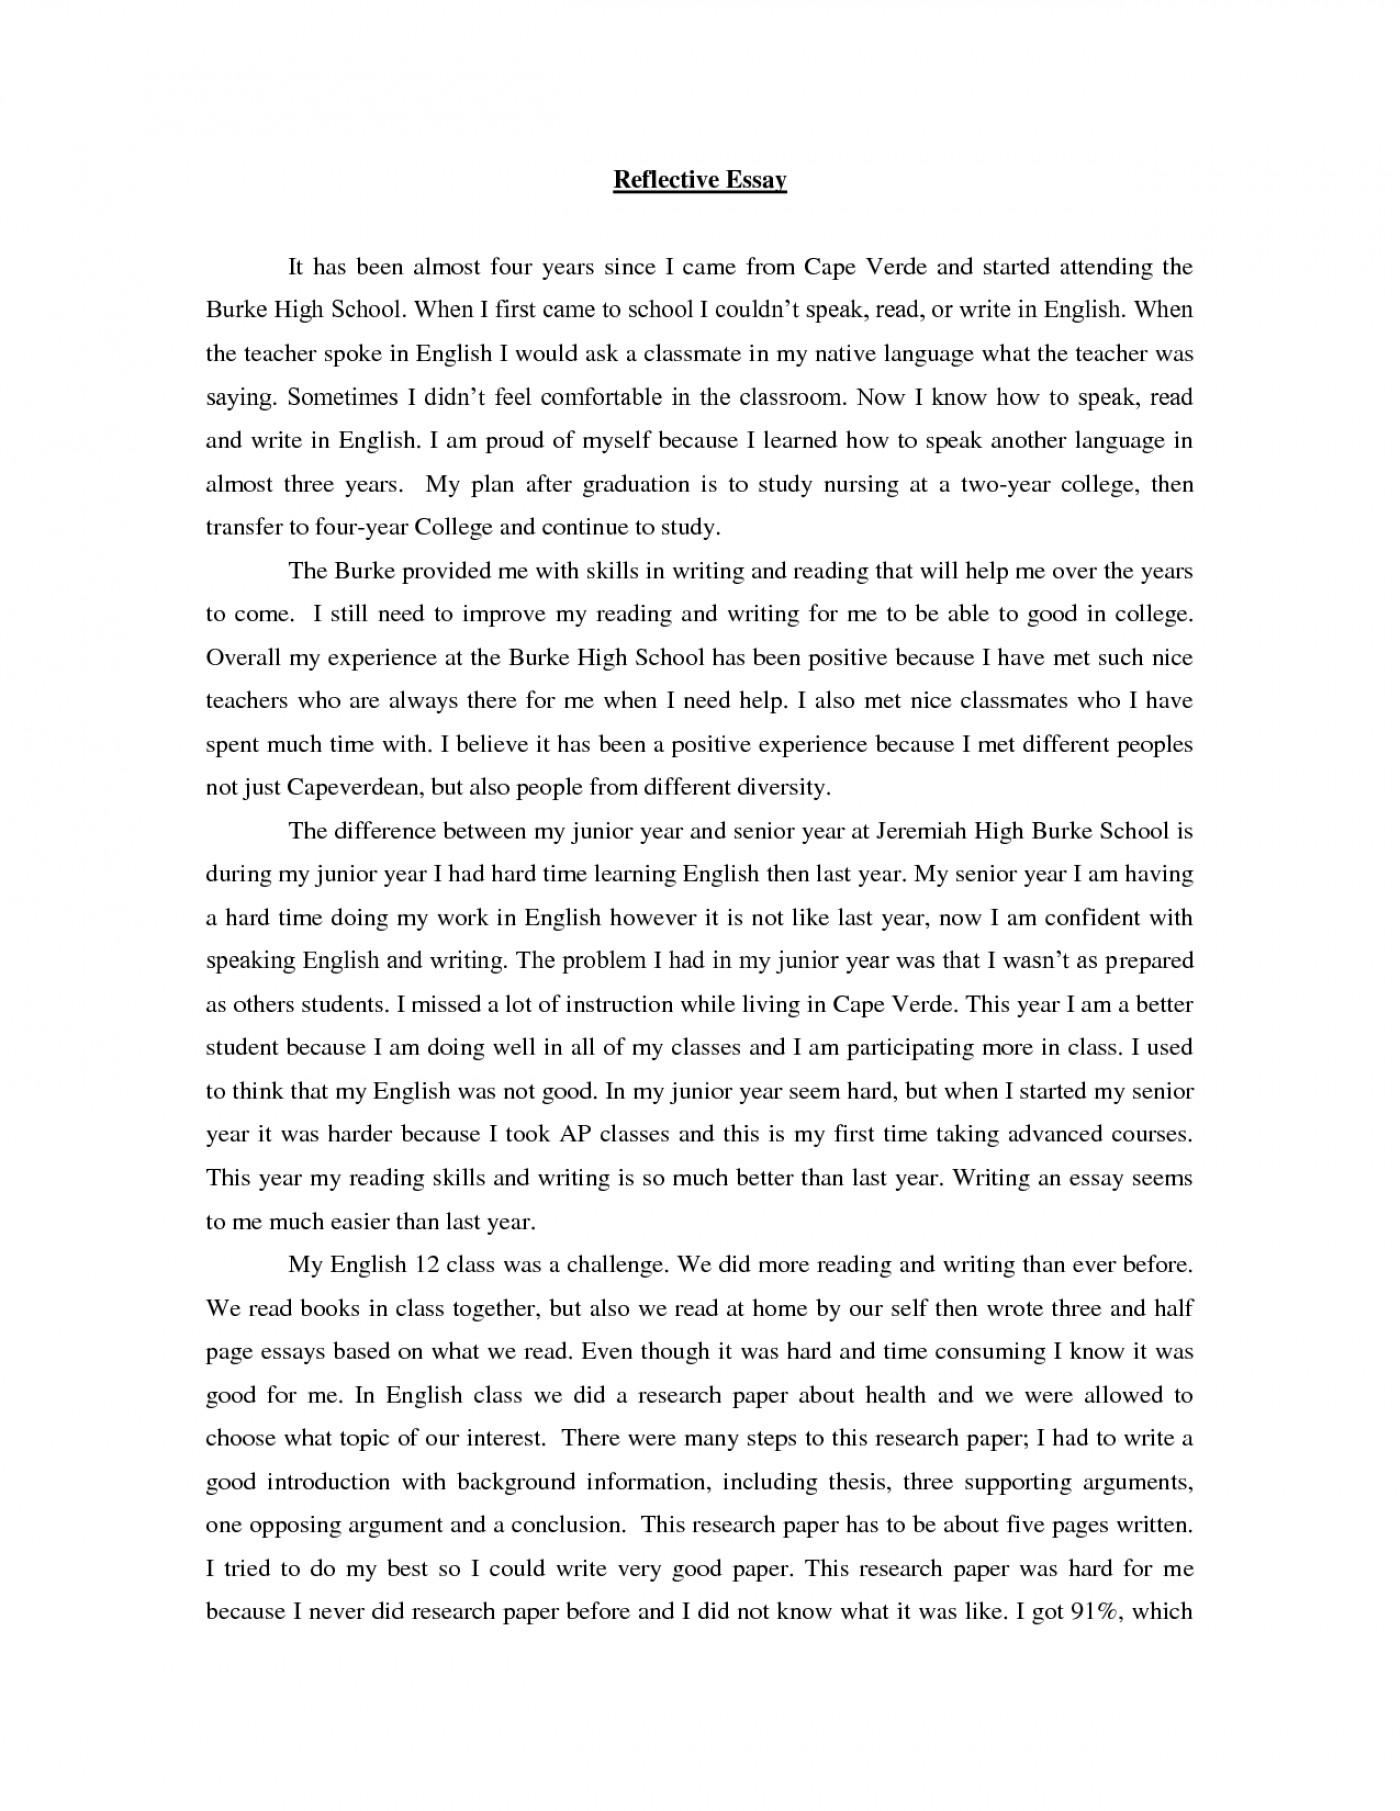 Buy nursing argumentative essay intellectual autobiography how to write